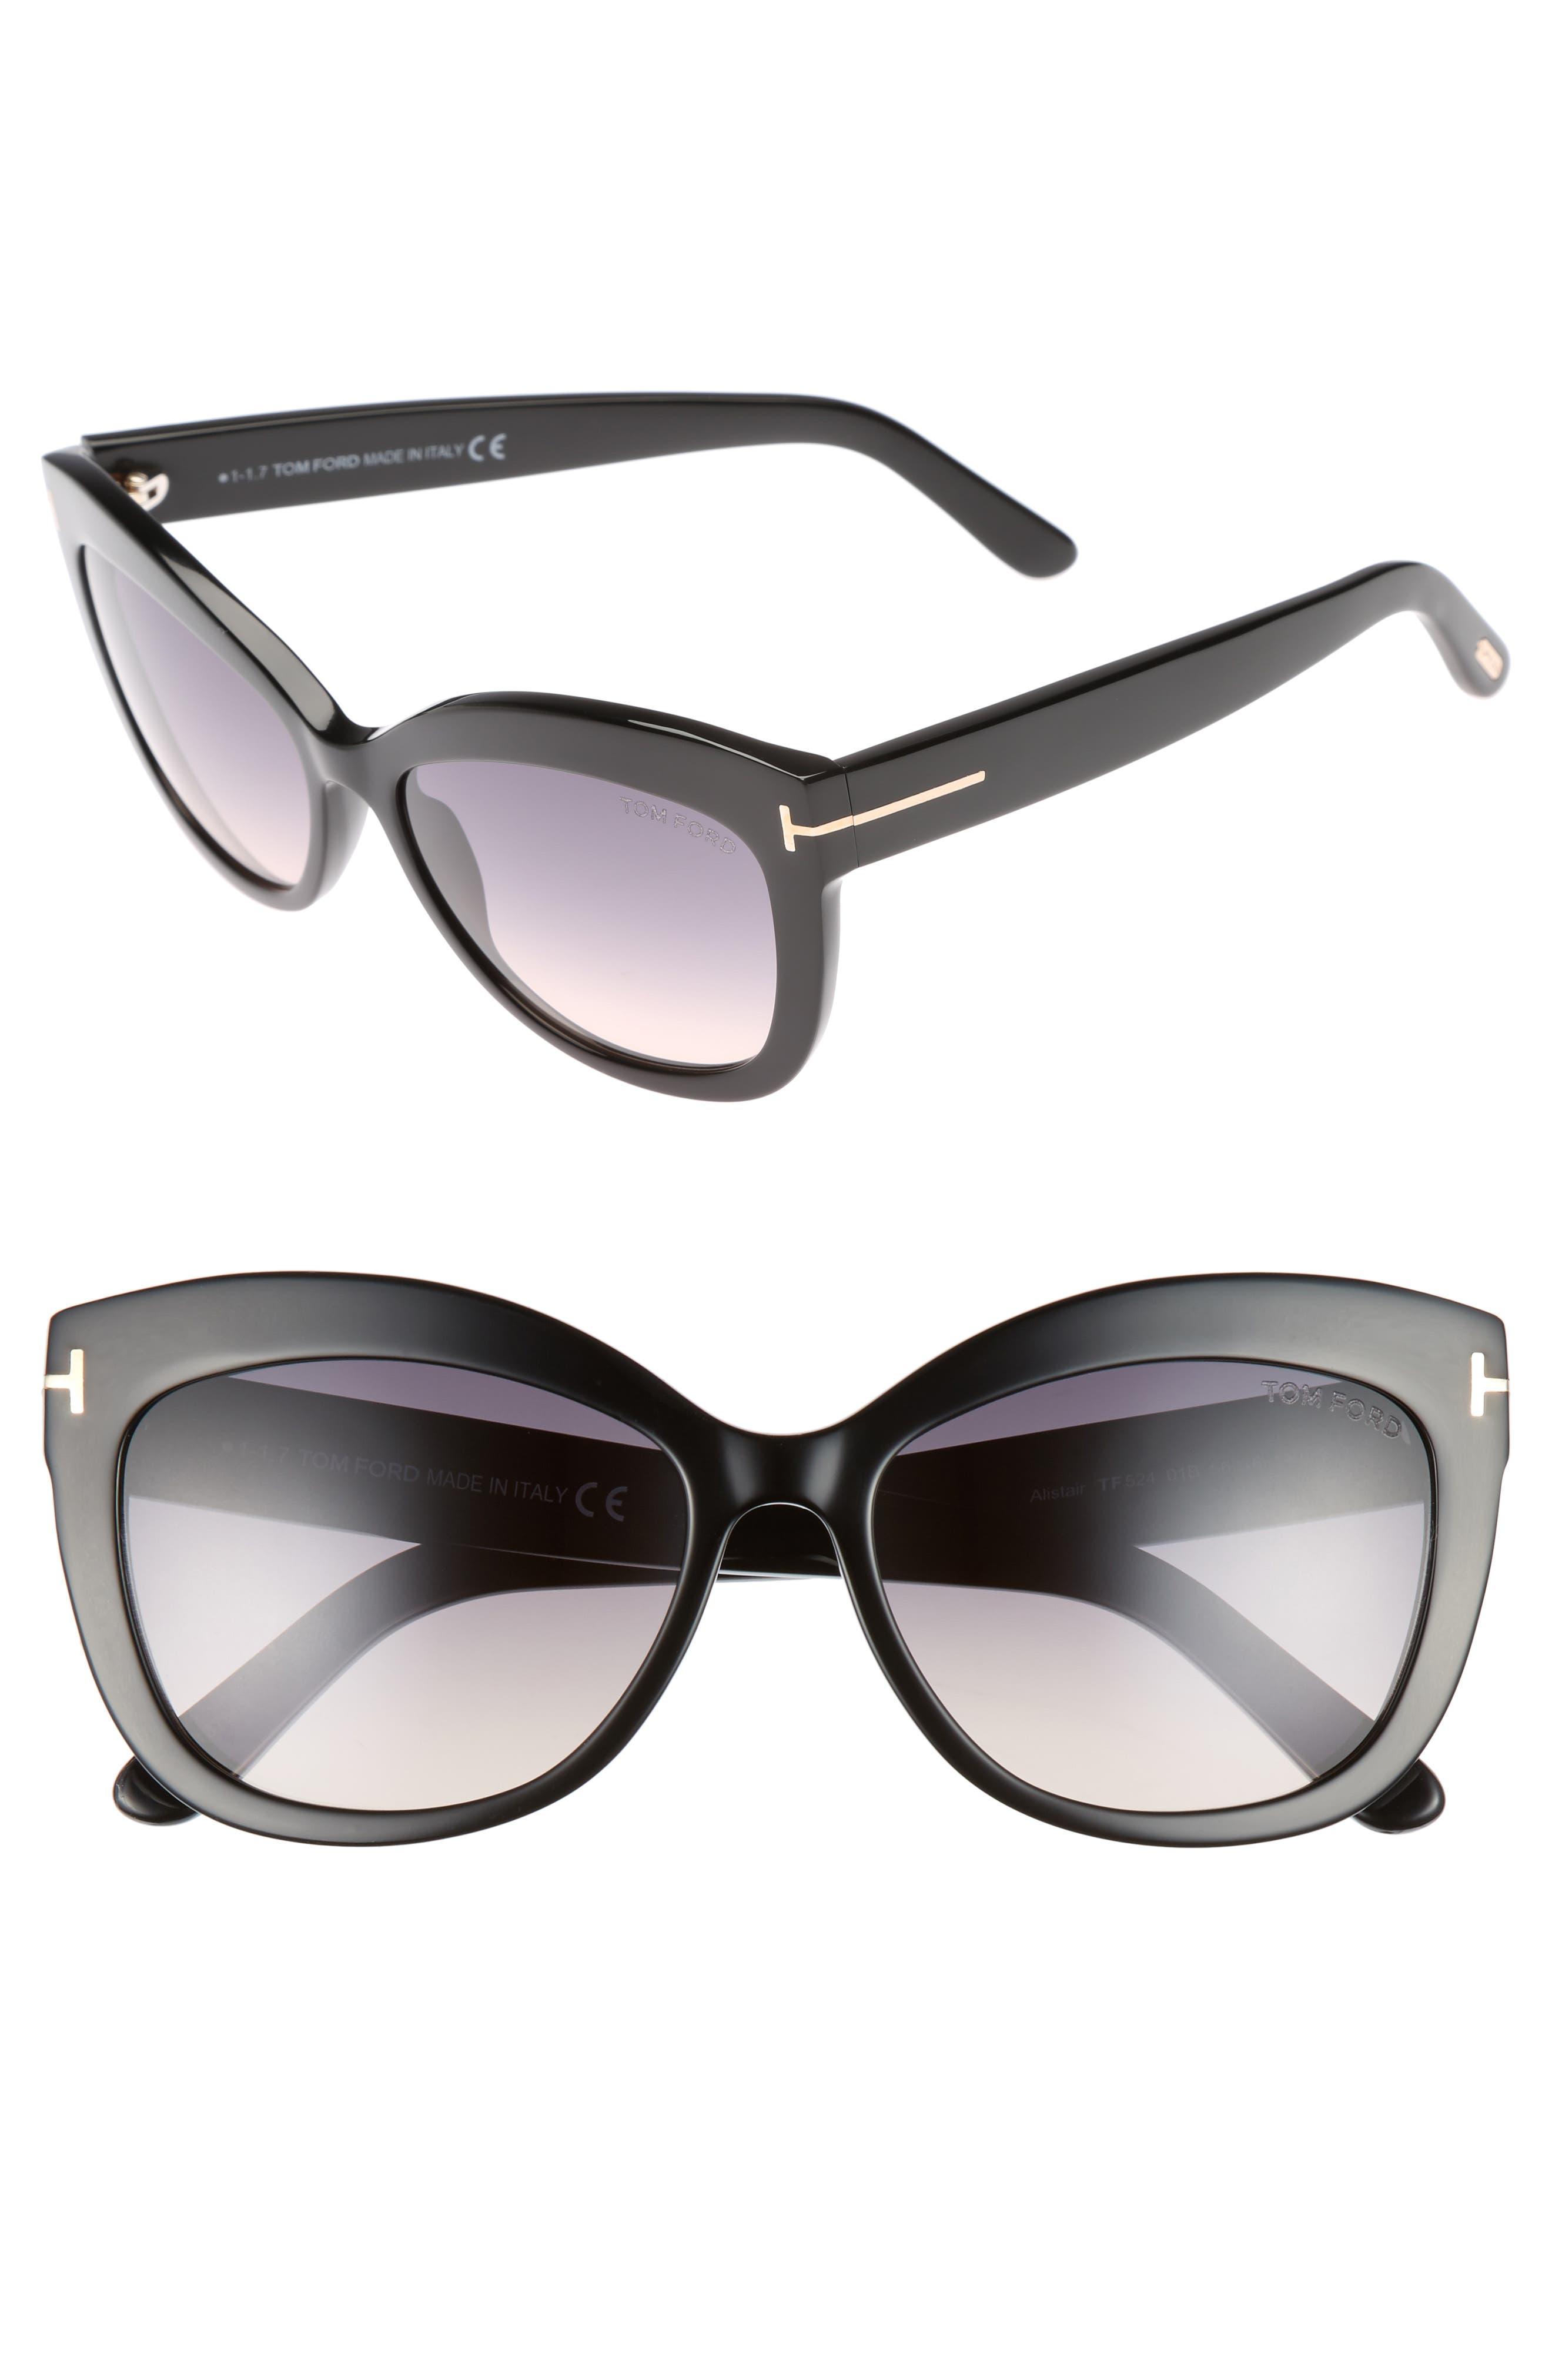 Alistair 56mm Gradient Sunglasses,                             Main thumbnail 1, color,                             SHINY BLACK / GRADIENT SMOKE